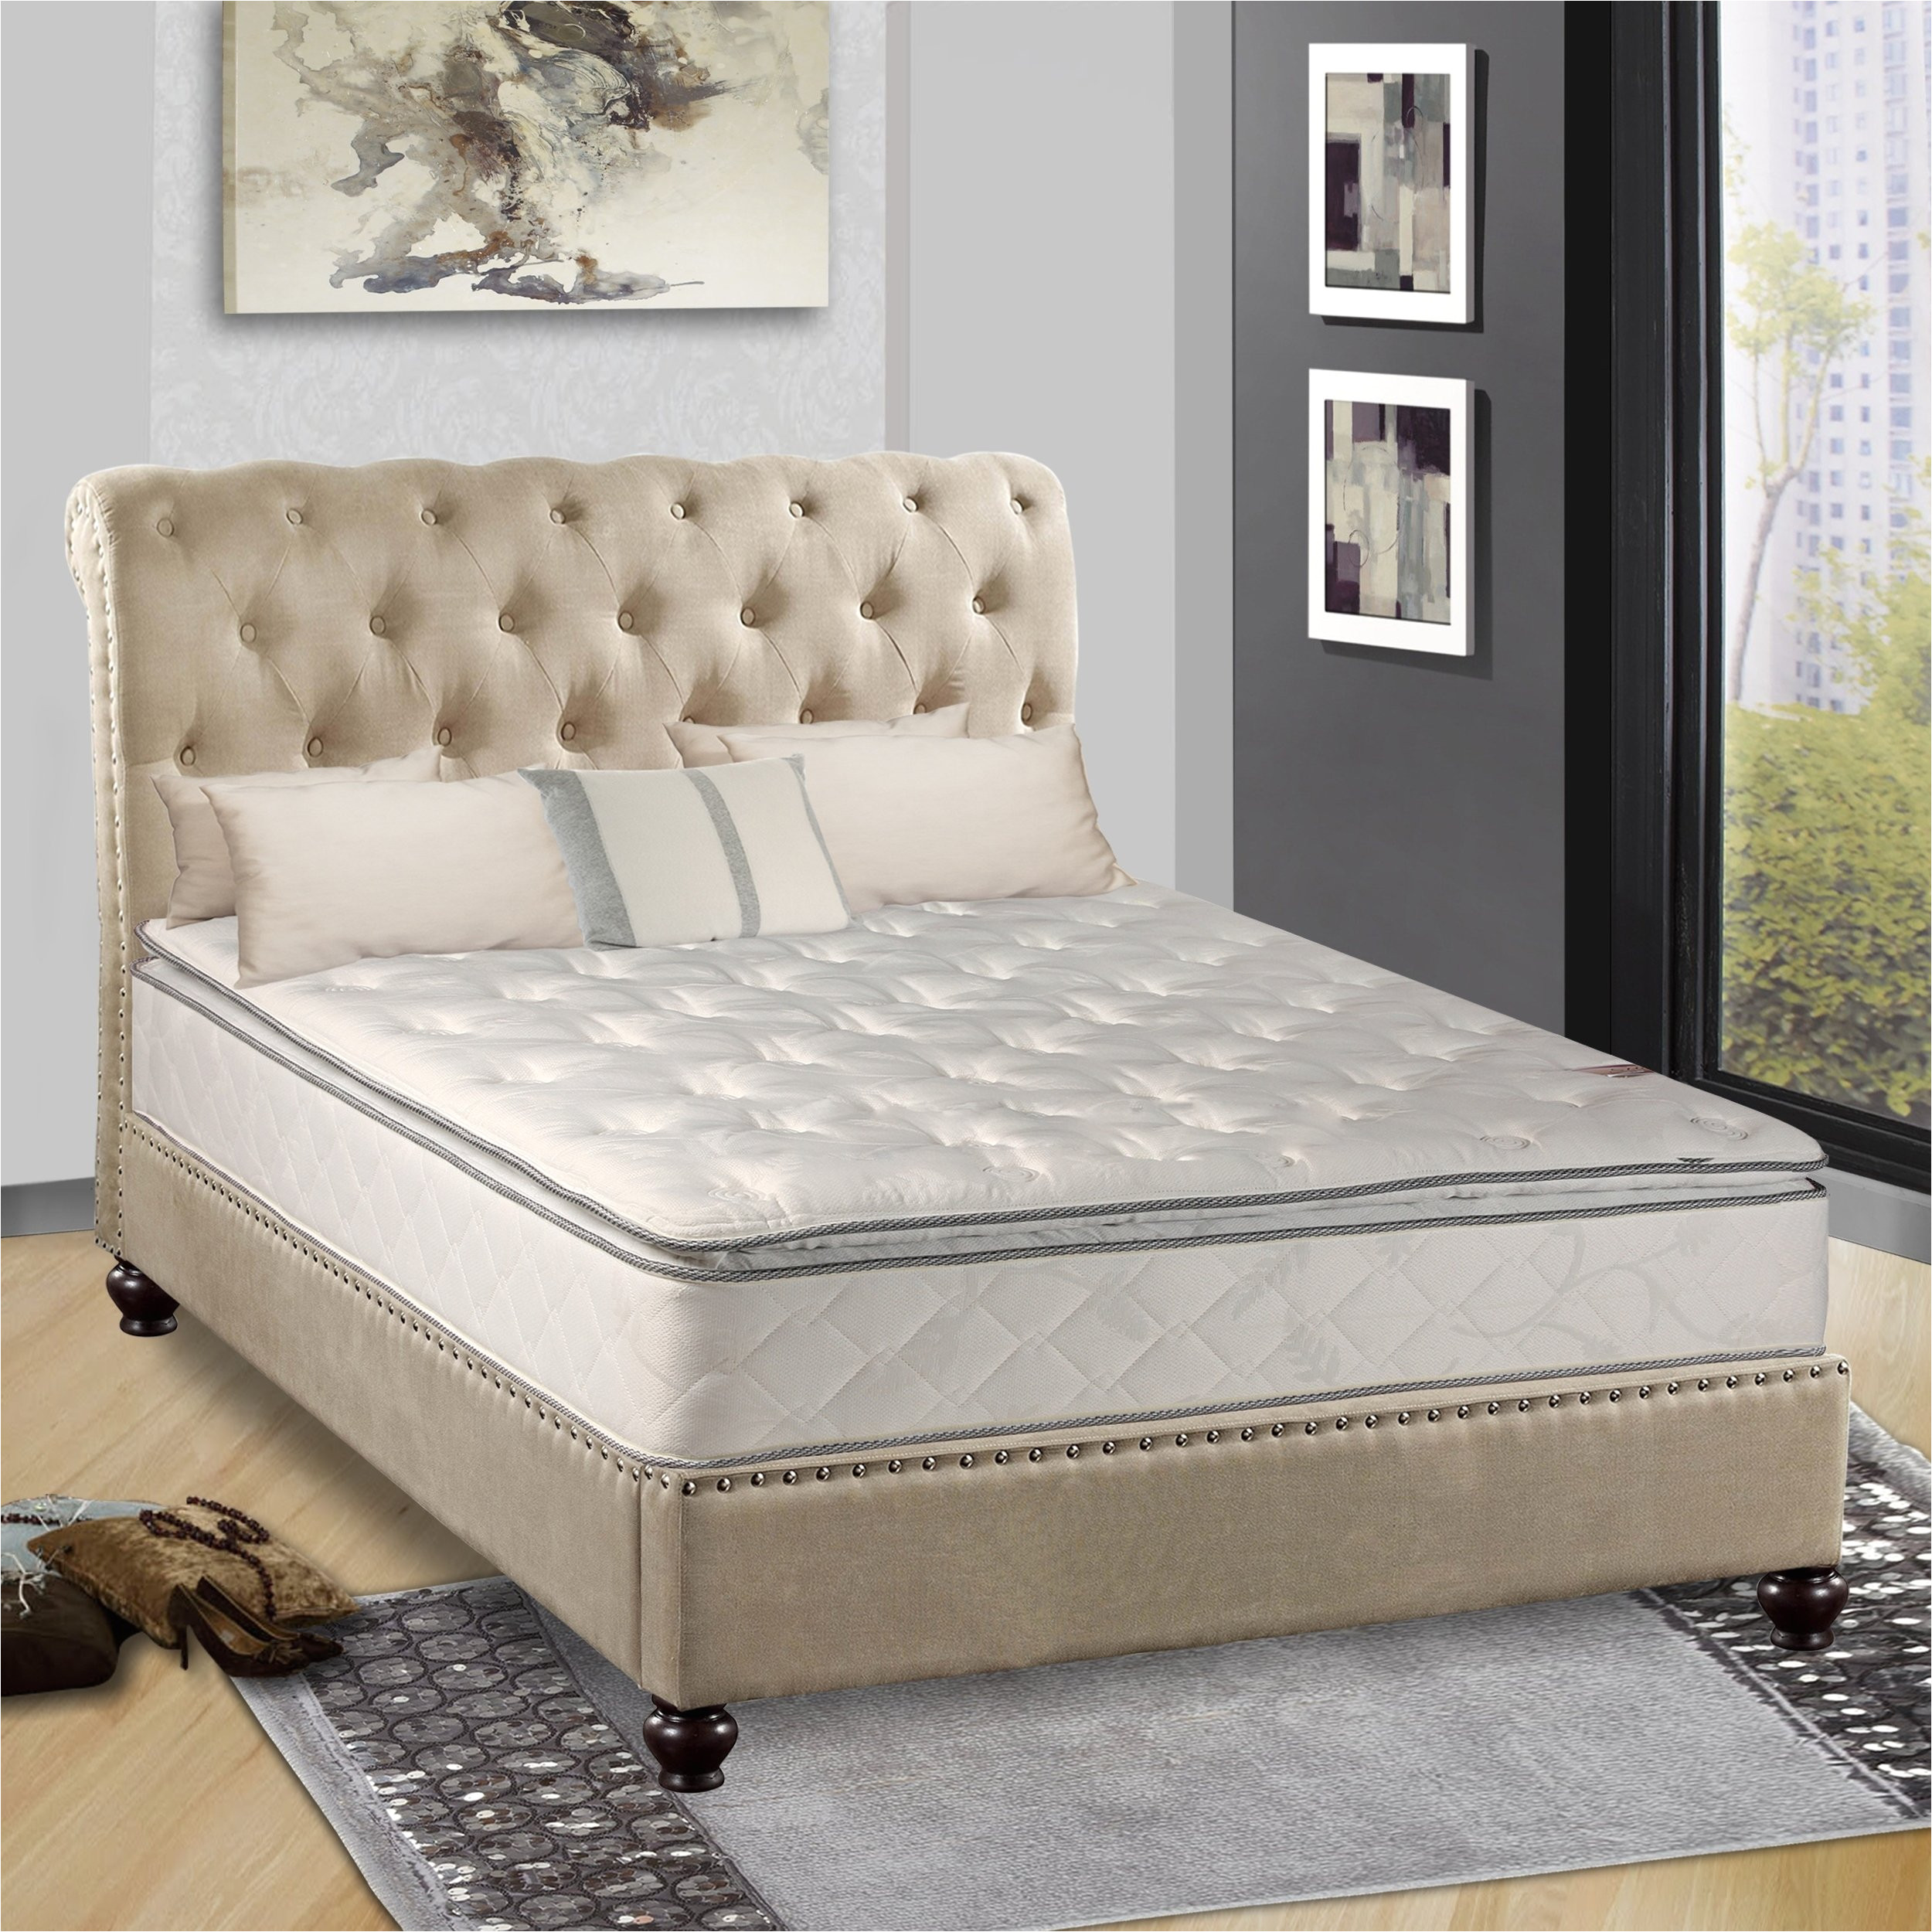 continental sleep medium plush pillowtop mattress twin size free shipping today overstock com 26112030